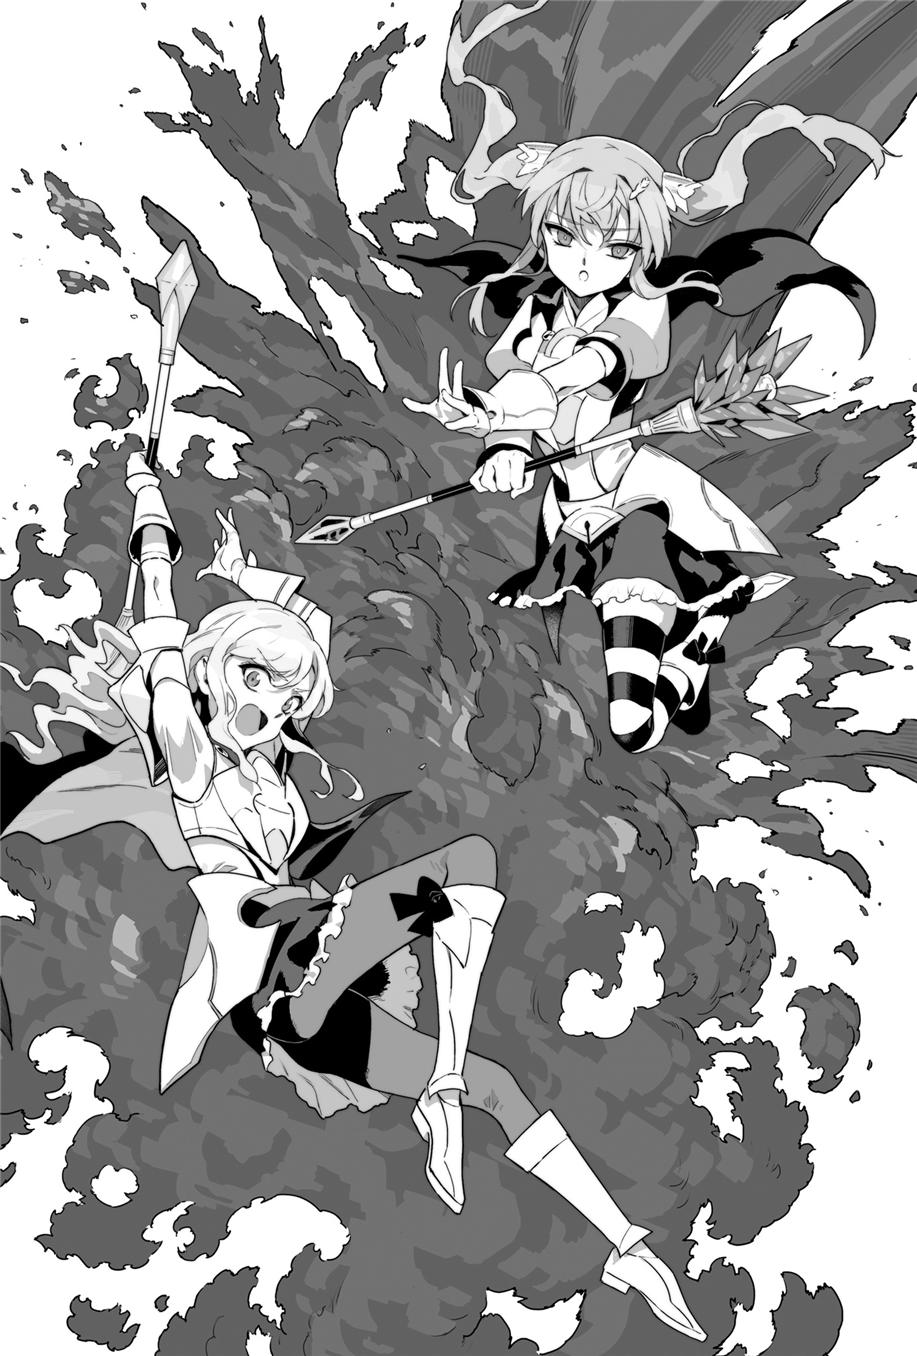 Death March Kara Hajimaru Isekai Kyousoukyoku / Death March to the Parallel World Rhapsody Light Novel Online Volume 20